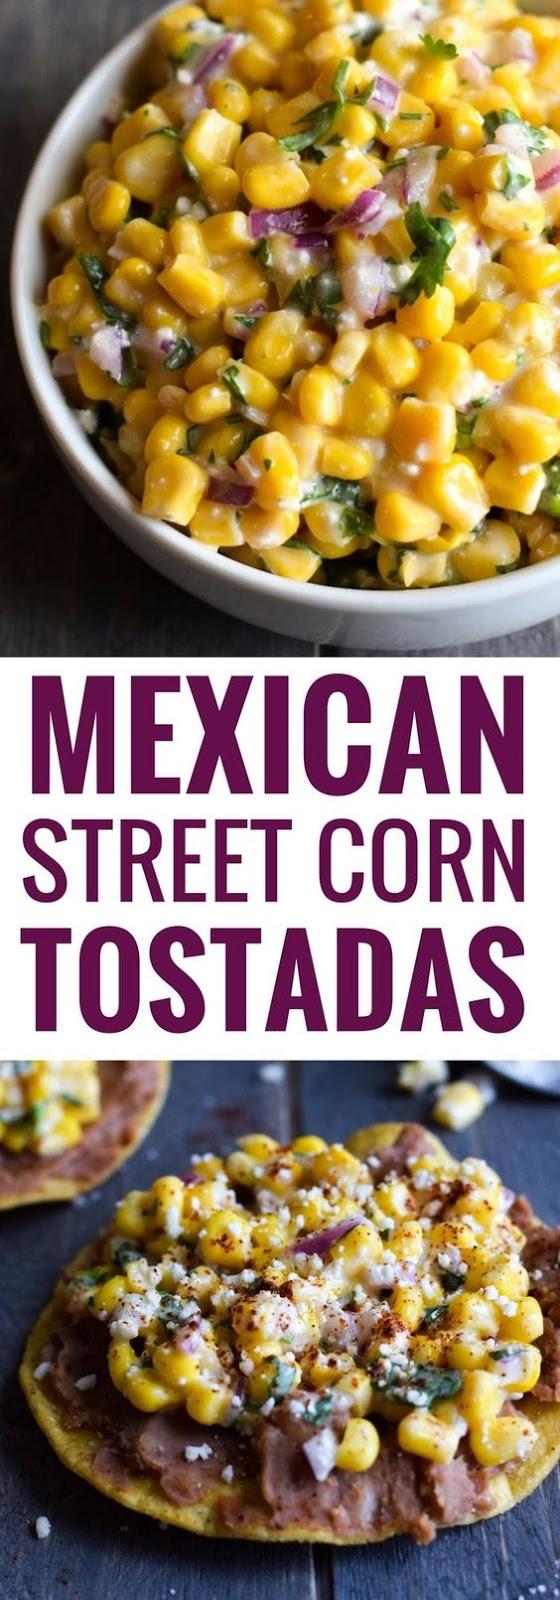 Mexican Street Corn Tostadas #mexicanfood #mexican #corn #tostadas #veggies #vegetarian #vegetarianrecipes